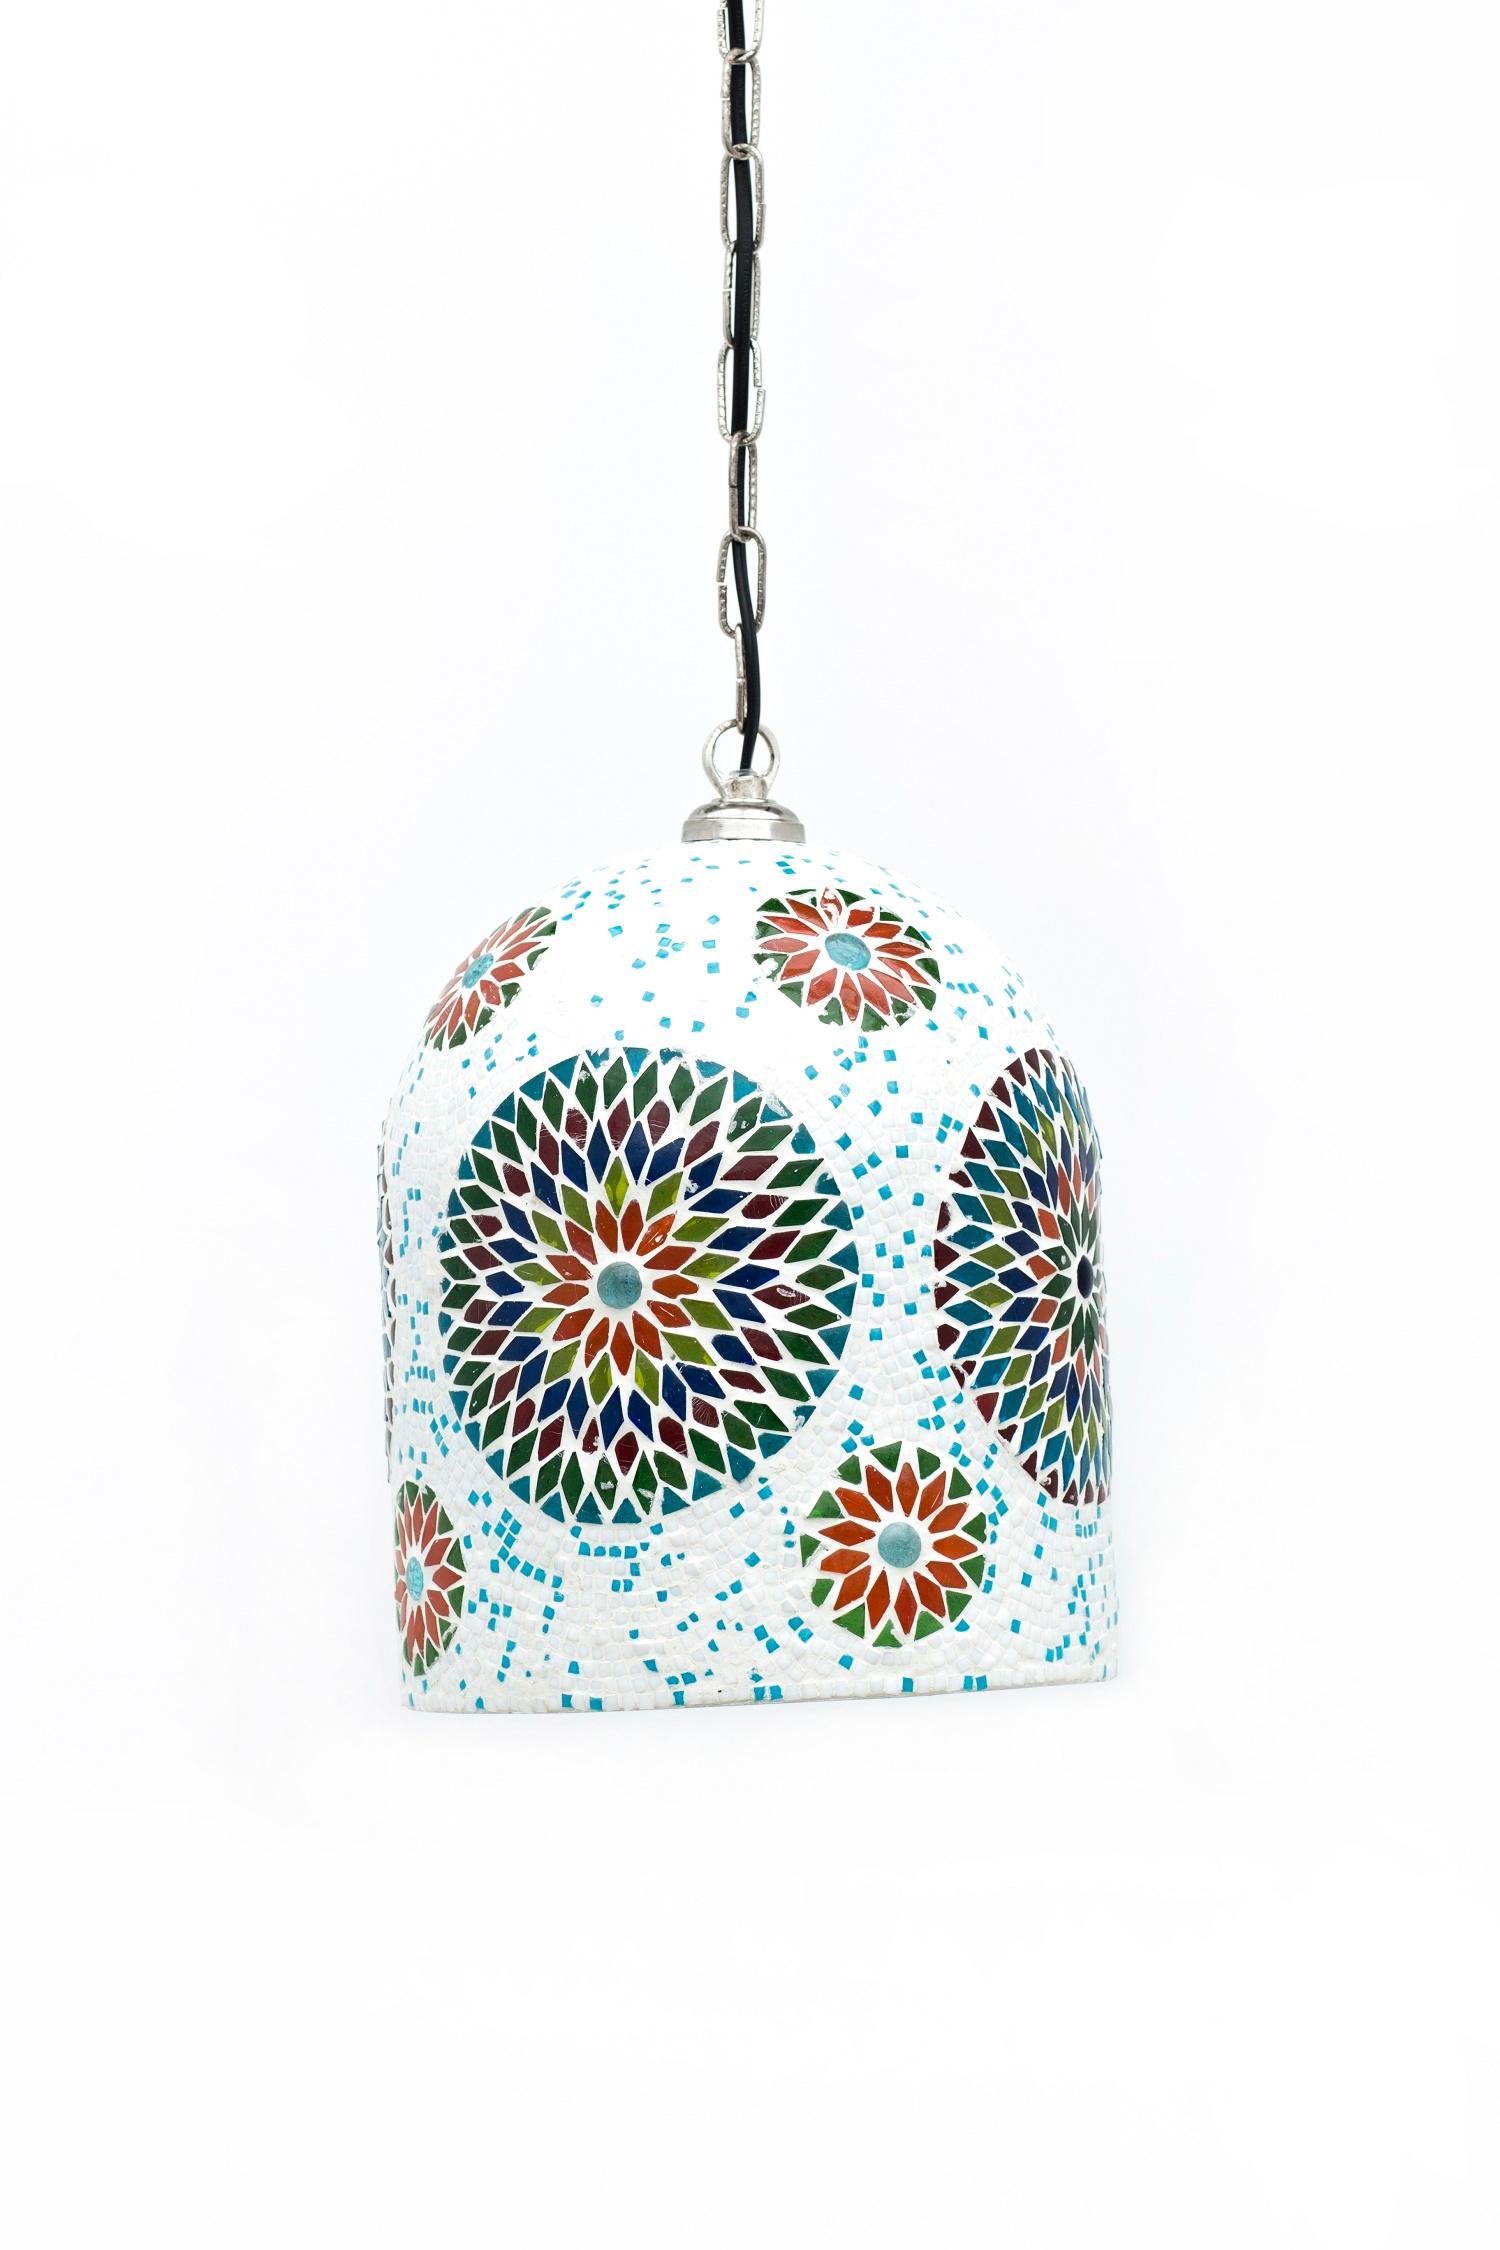 Lampe Hngelampe Mosaiklampe Kochi Beleuchtung Orientalisch CKamalla